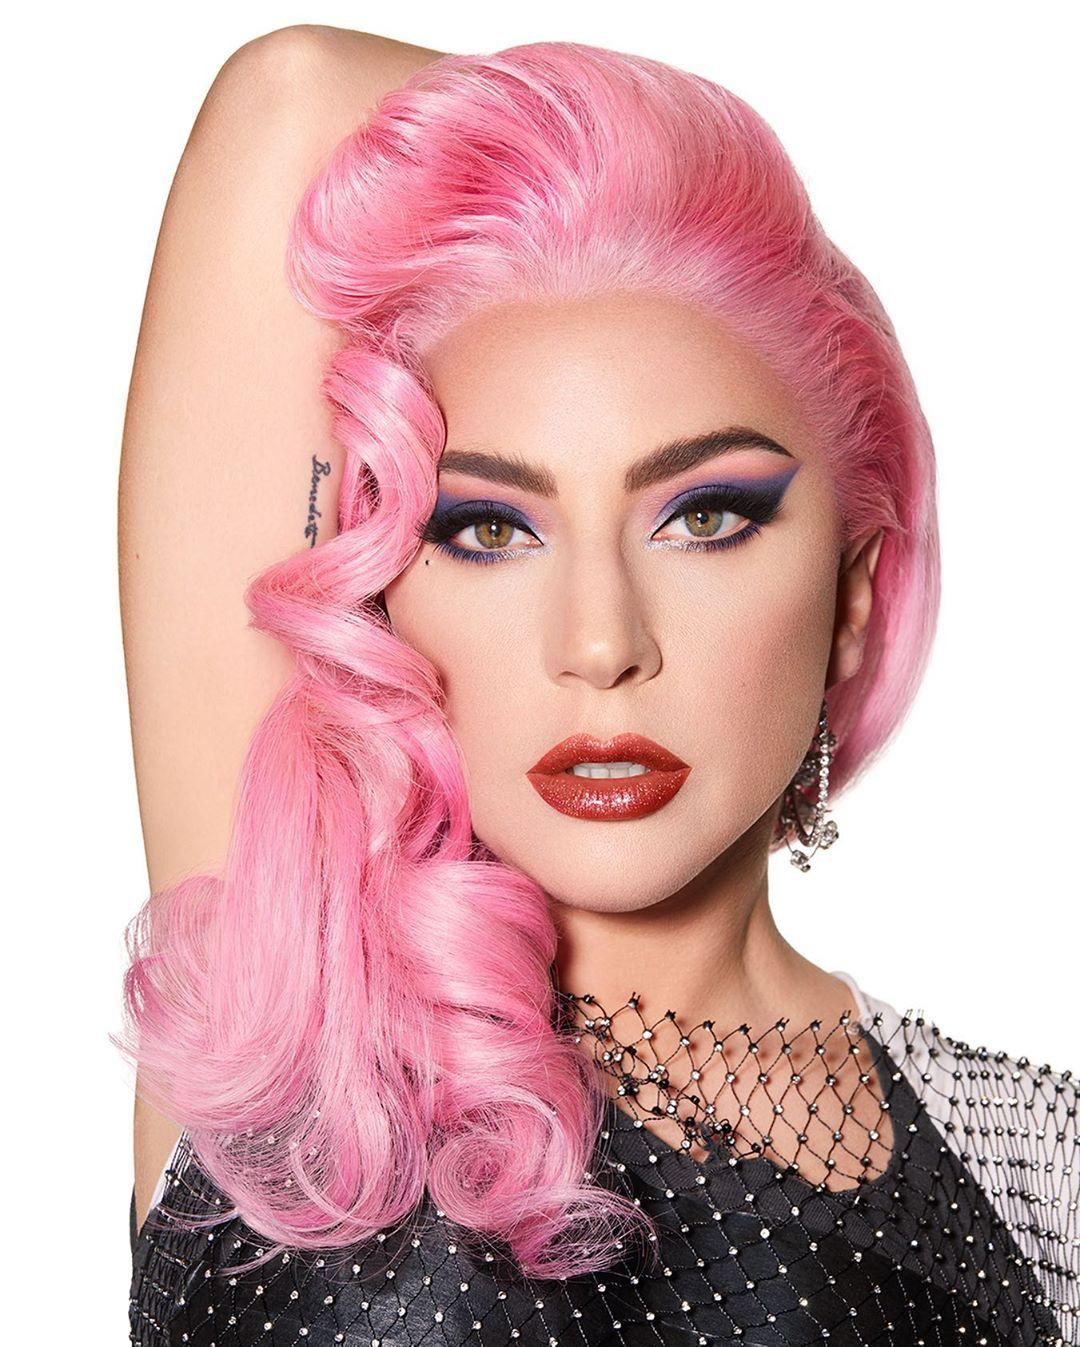 Photo Courtesy: Lady Gaga/Instagram